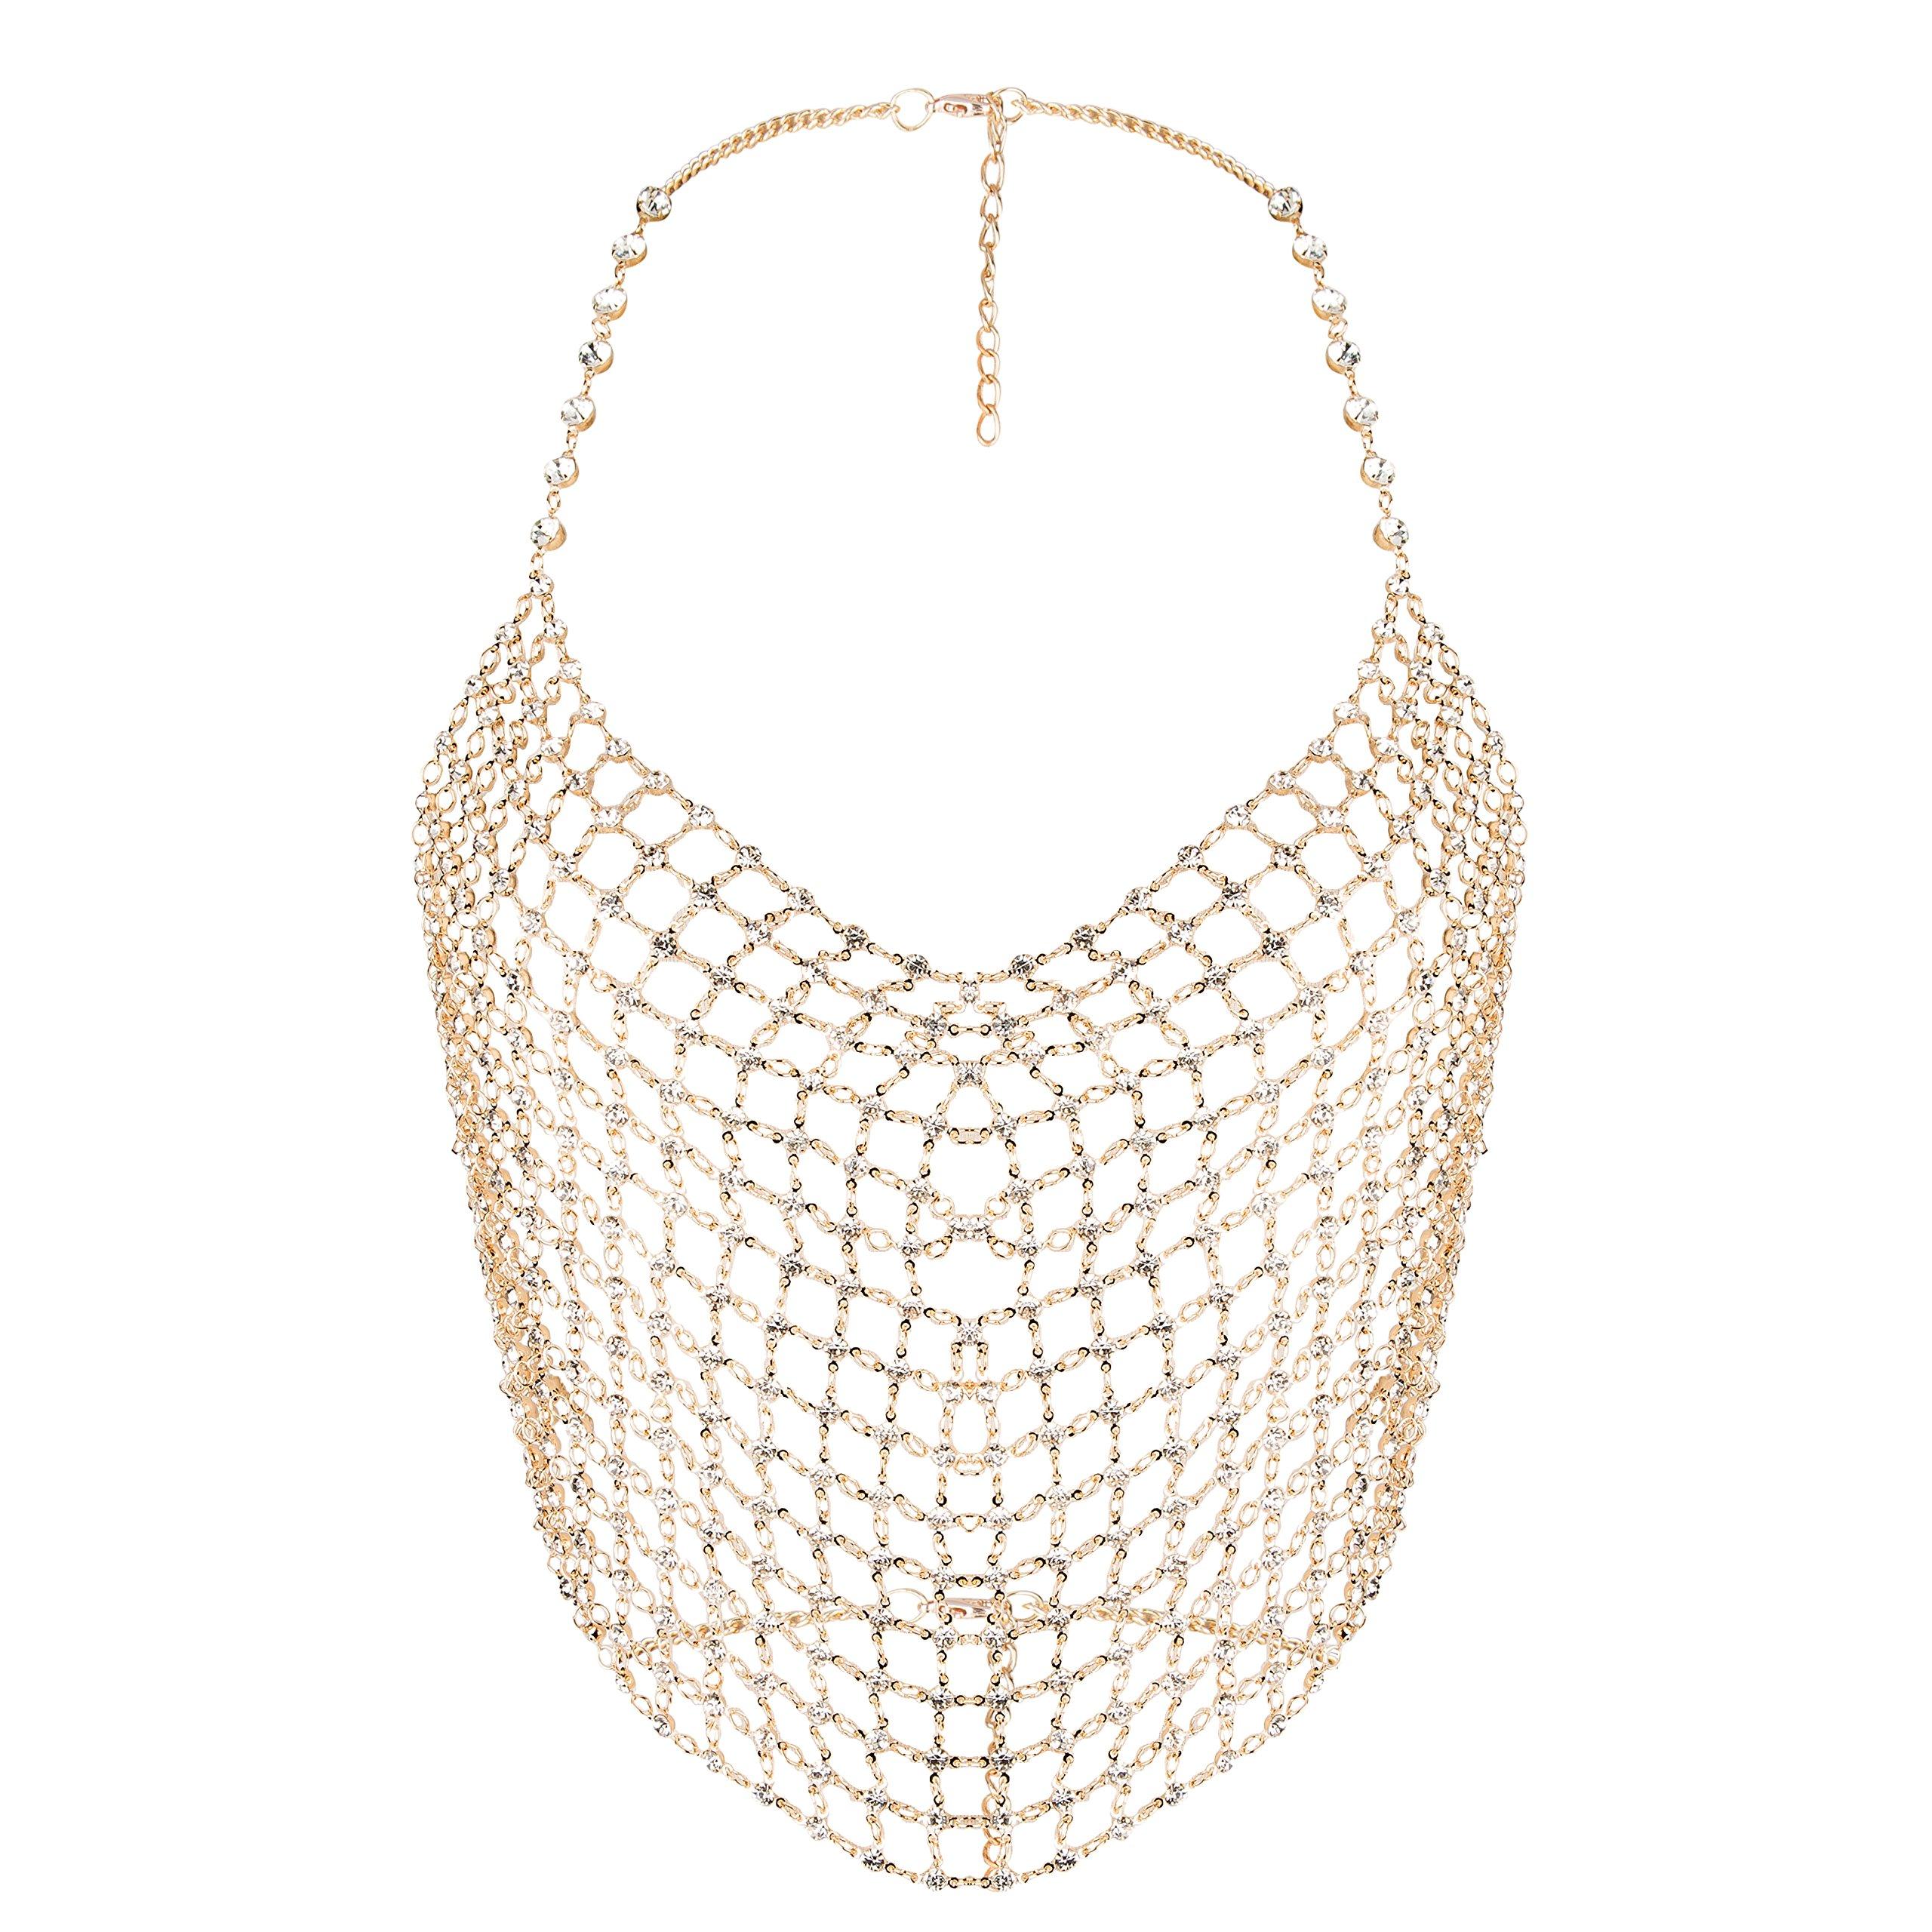 lan27 Sexy Women Nightclub Bling Crystal Bellyhand Party Body Chain Jewelry Bikini Waist Gold Belly Beach Cami Tops Vest Tank (bellyband)